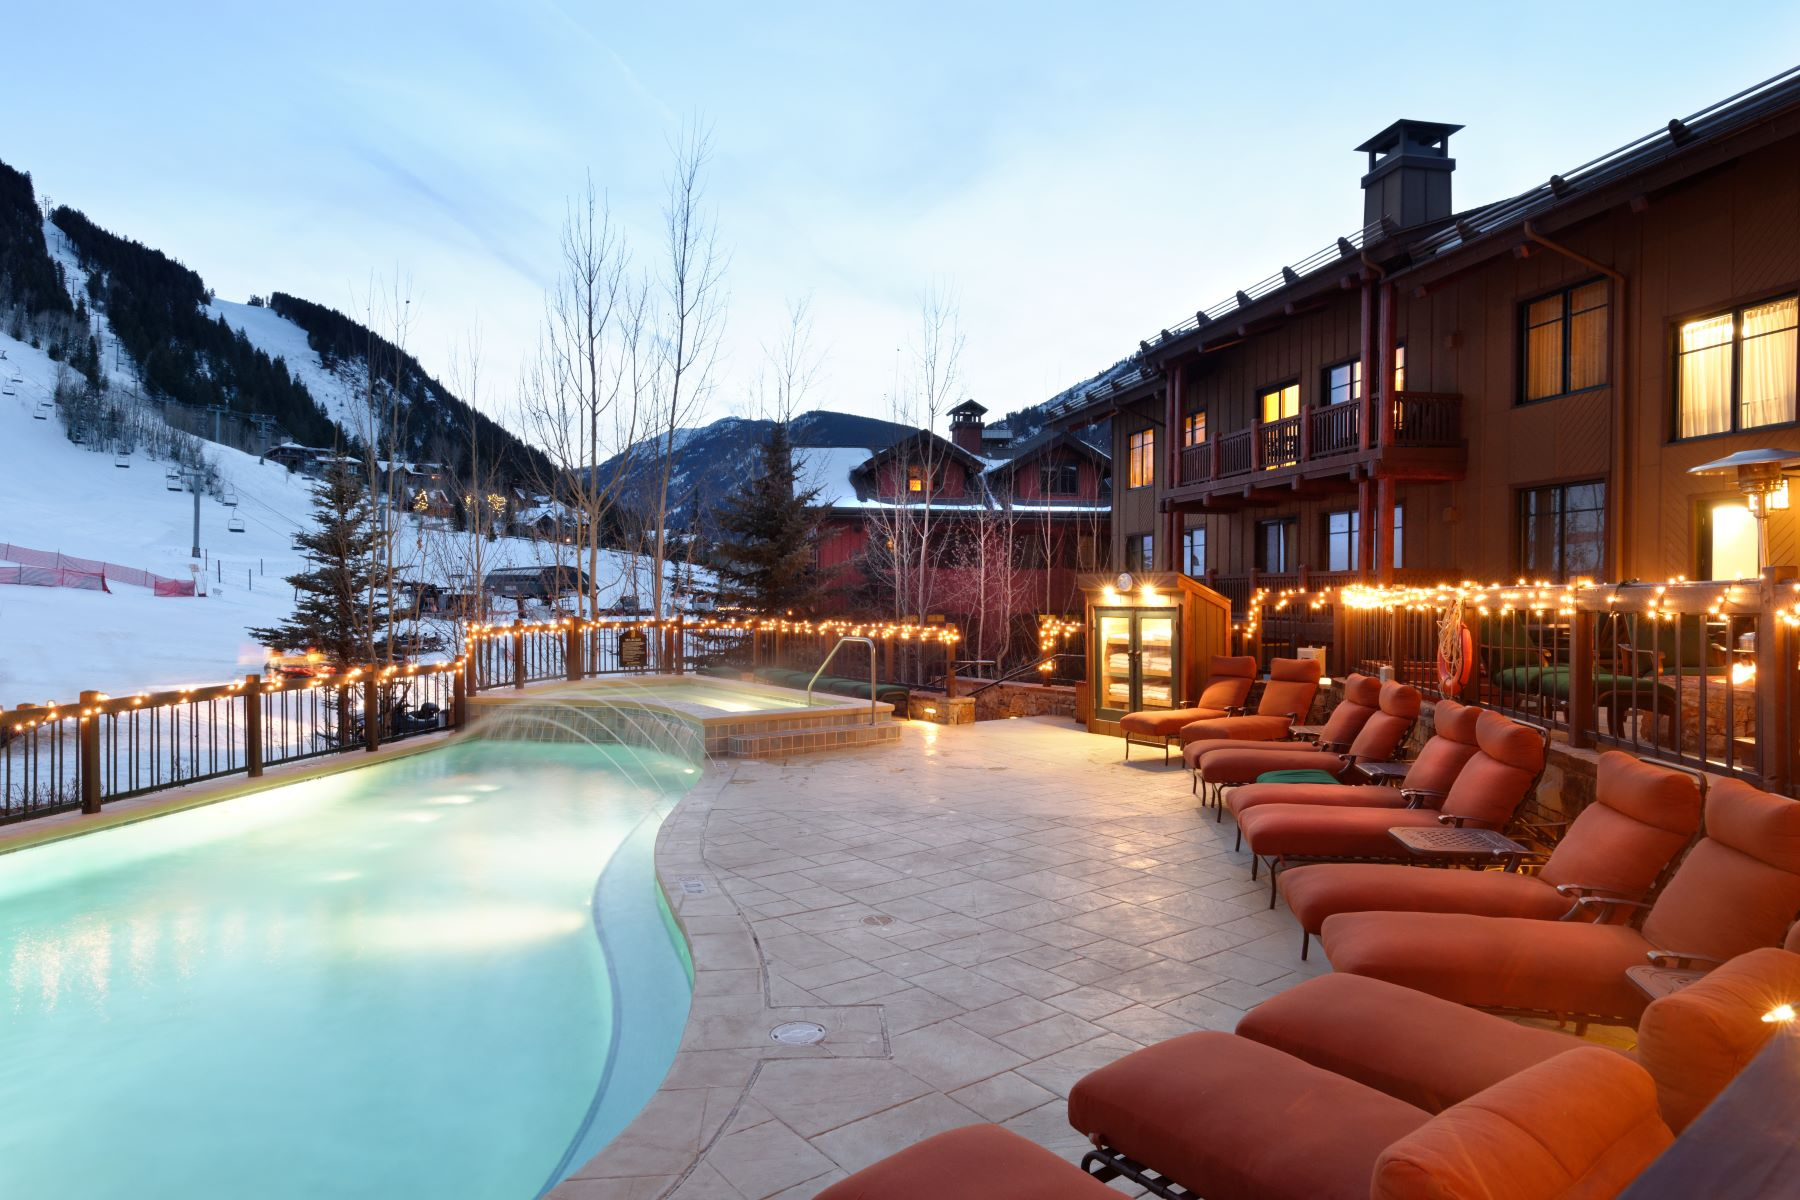 部分所有權 為 出售 在 Ritz-Carlton Club Fractional Condo Interest 0197 Prospector Road, 2410 Fixed: 23, 24, 48, Aspen, 科羅拉多州, 81611 美國